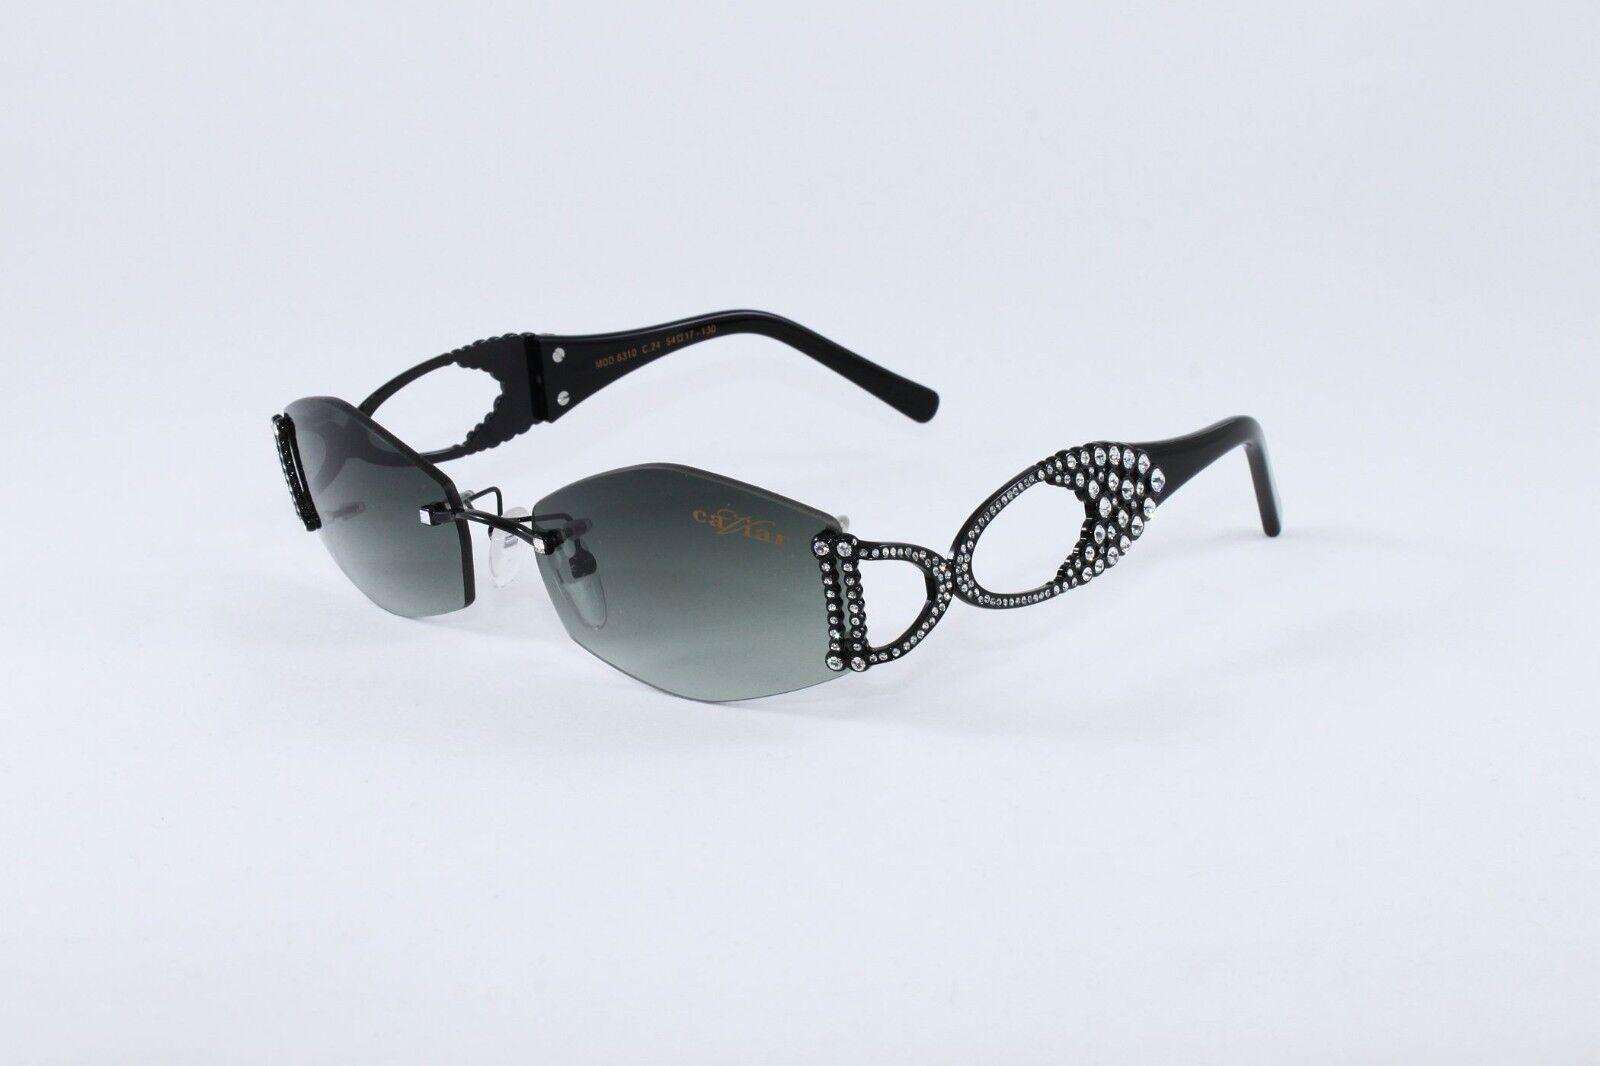 c28e52f6670c CAVIAR Sunglasses 6310 C24 Champagne Series Black Austrian Crystals ...